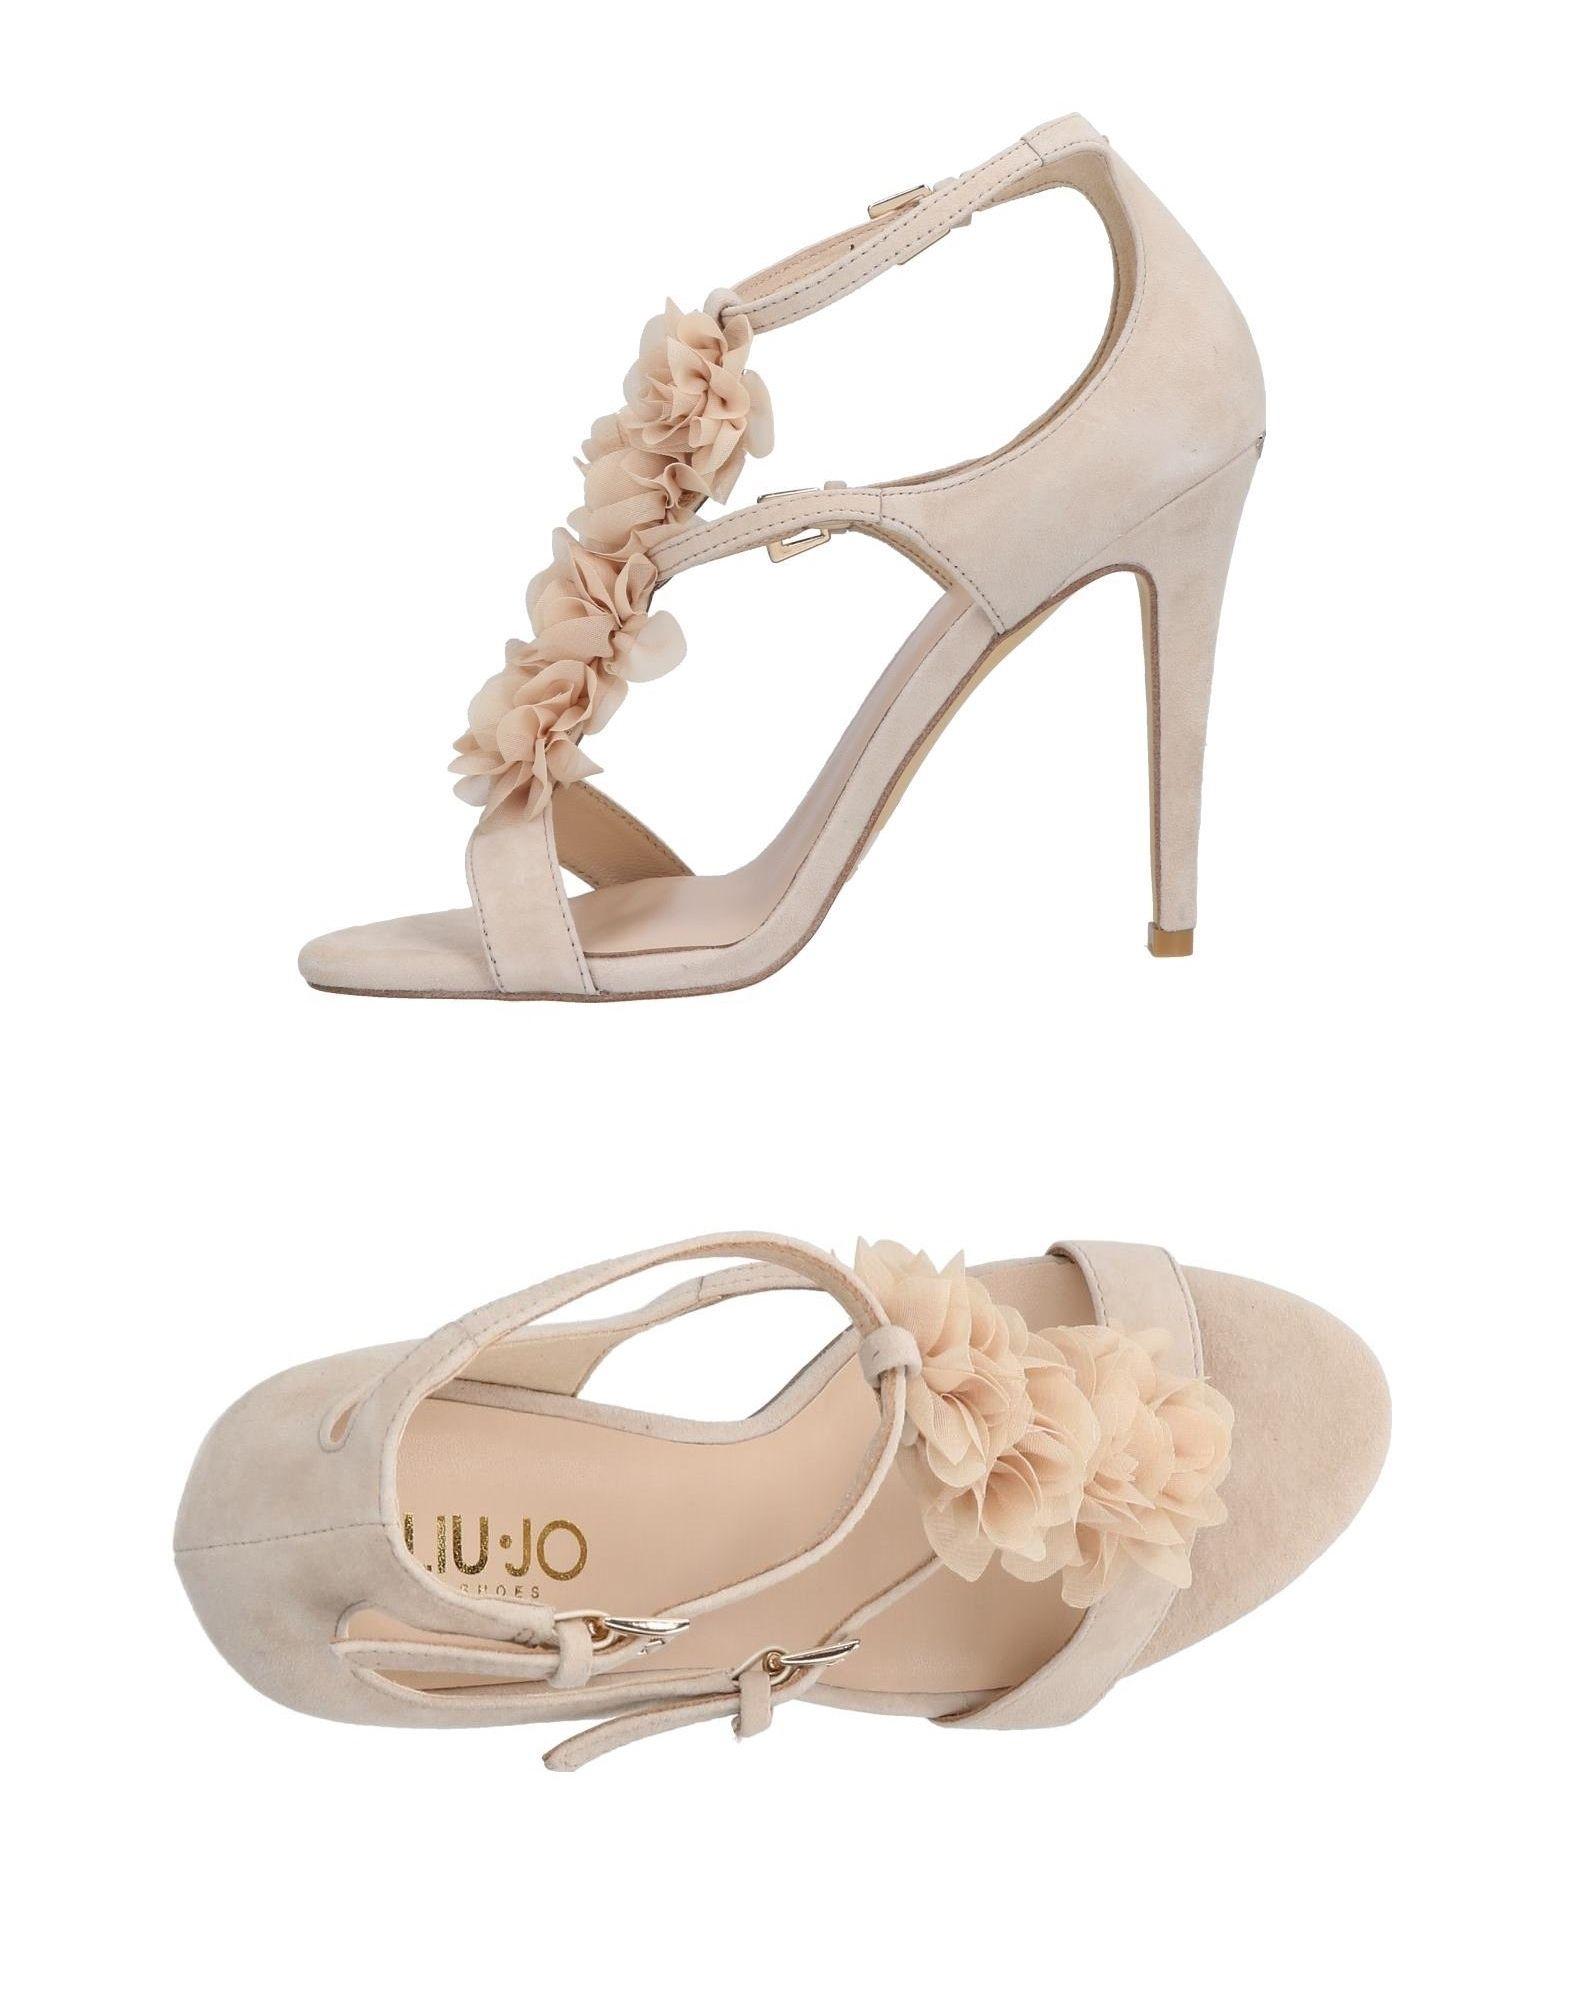 Liu •Jo Shoes Sandals - Women Liu •Jo Shoes Sandals - online on  Canada - Sandals 11481777HW a85ffd